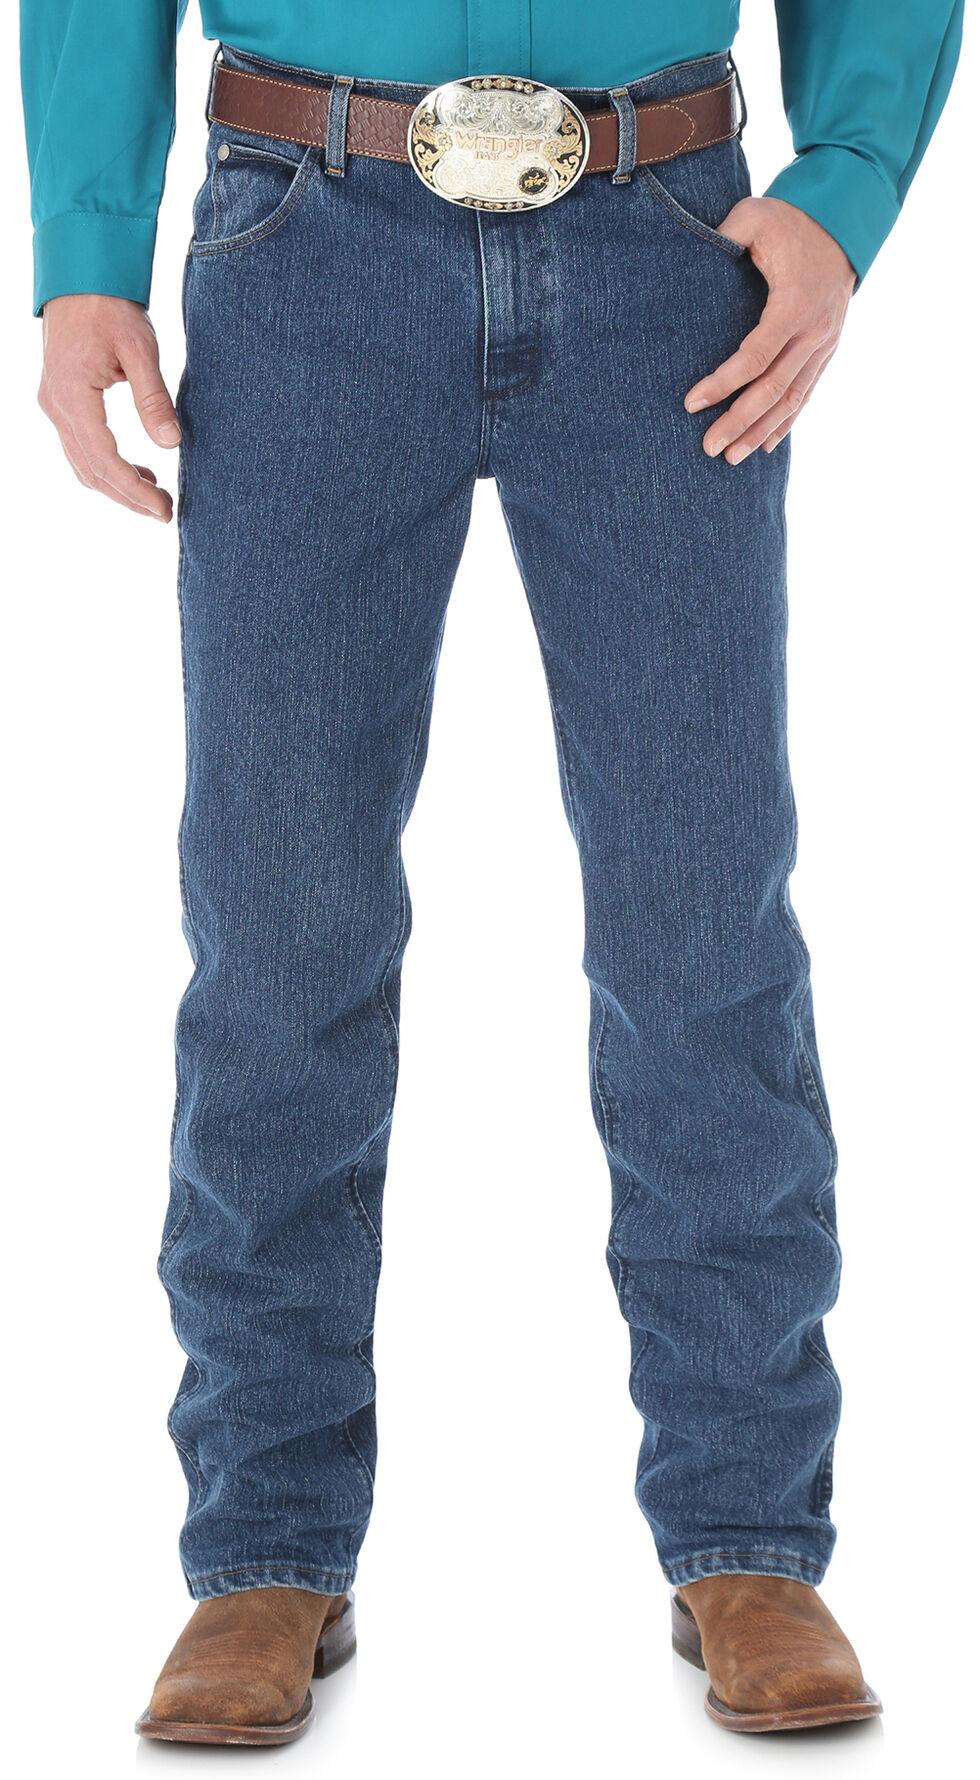 Wrangler Men's Premium Performance Cool Vantage Cowboy Cut Slim Fit Jeans, Dark Stone, hi-res